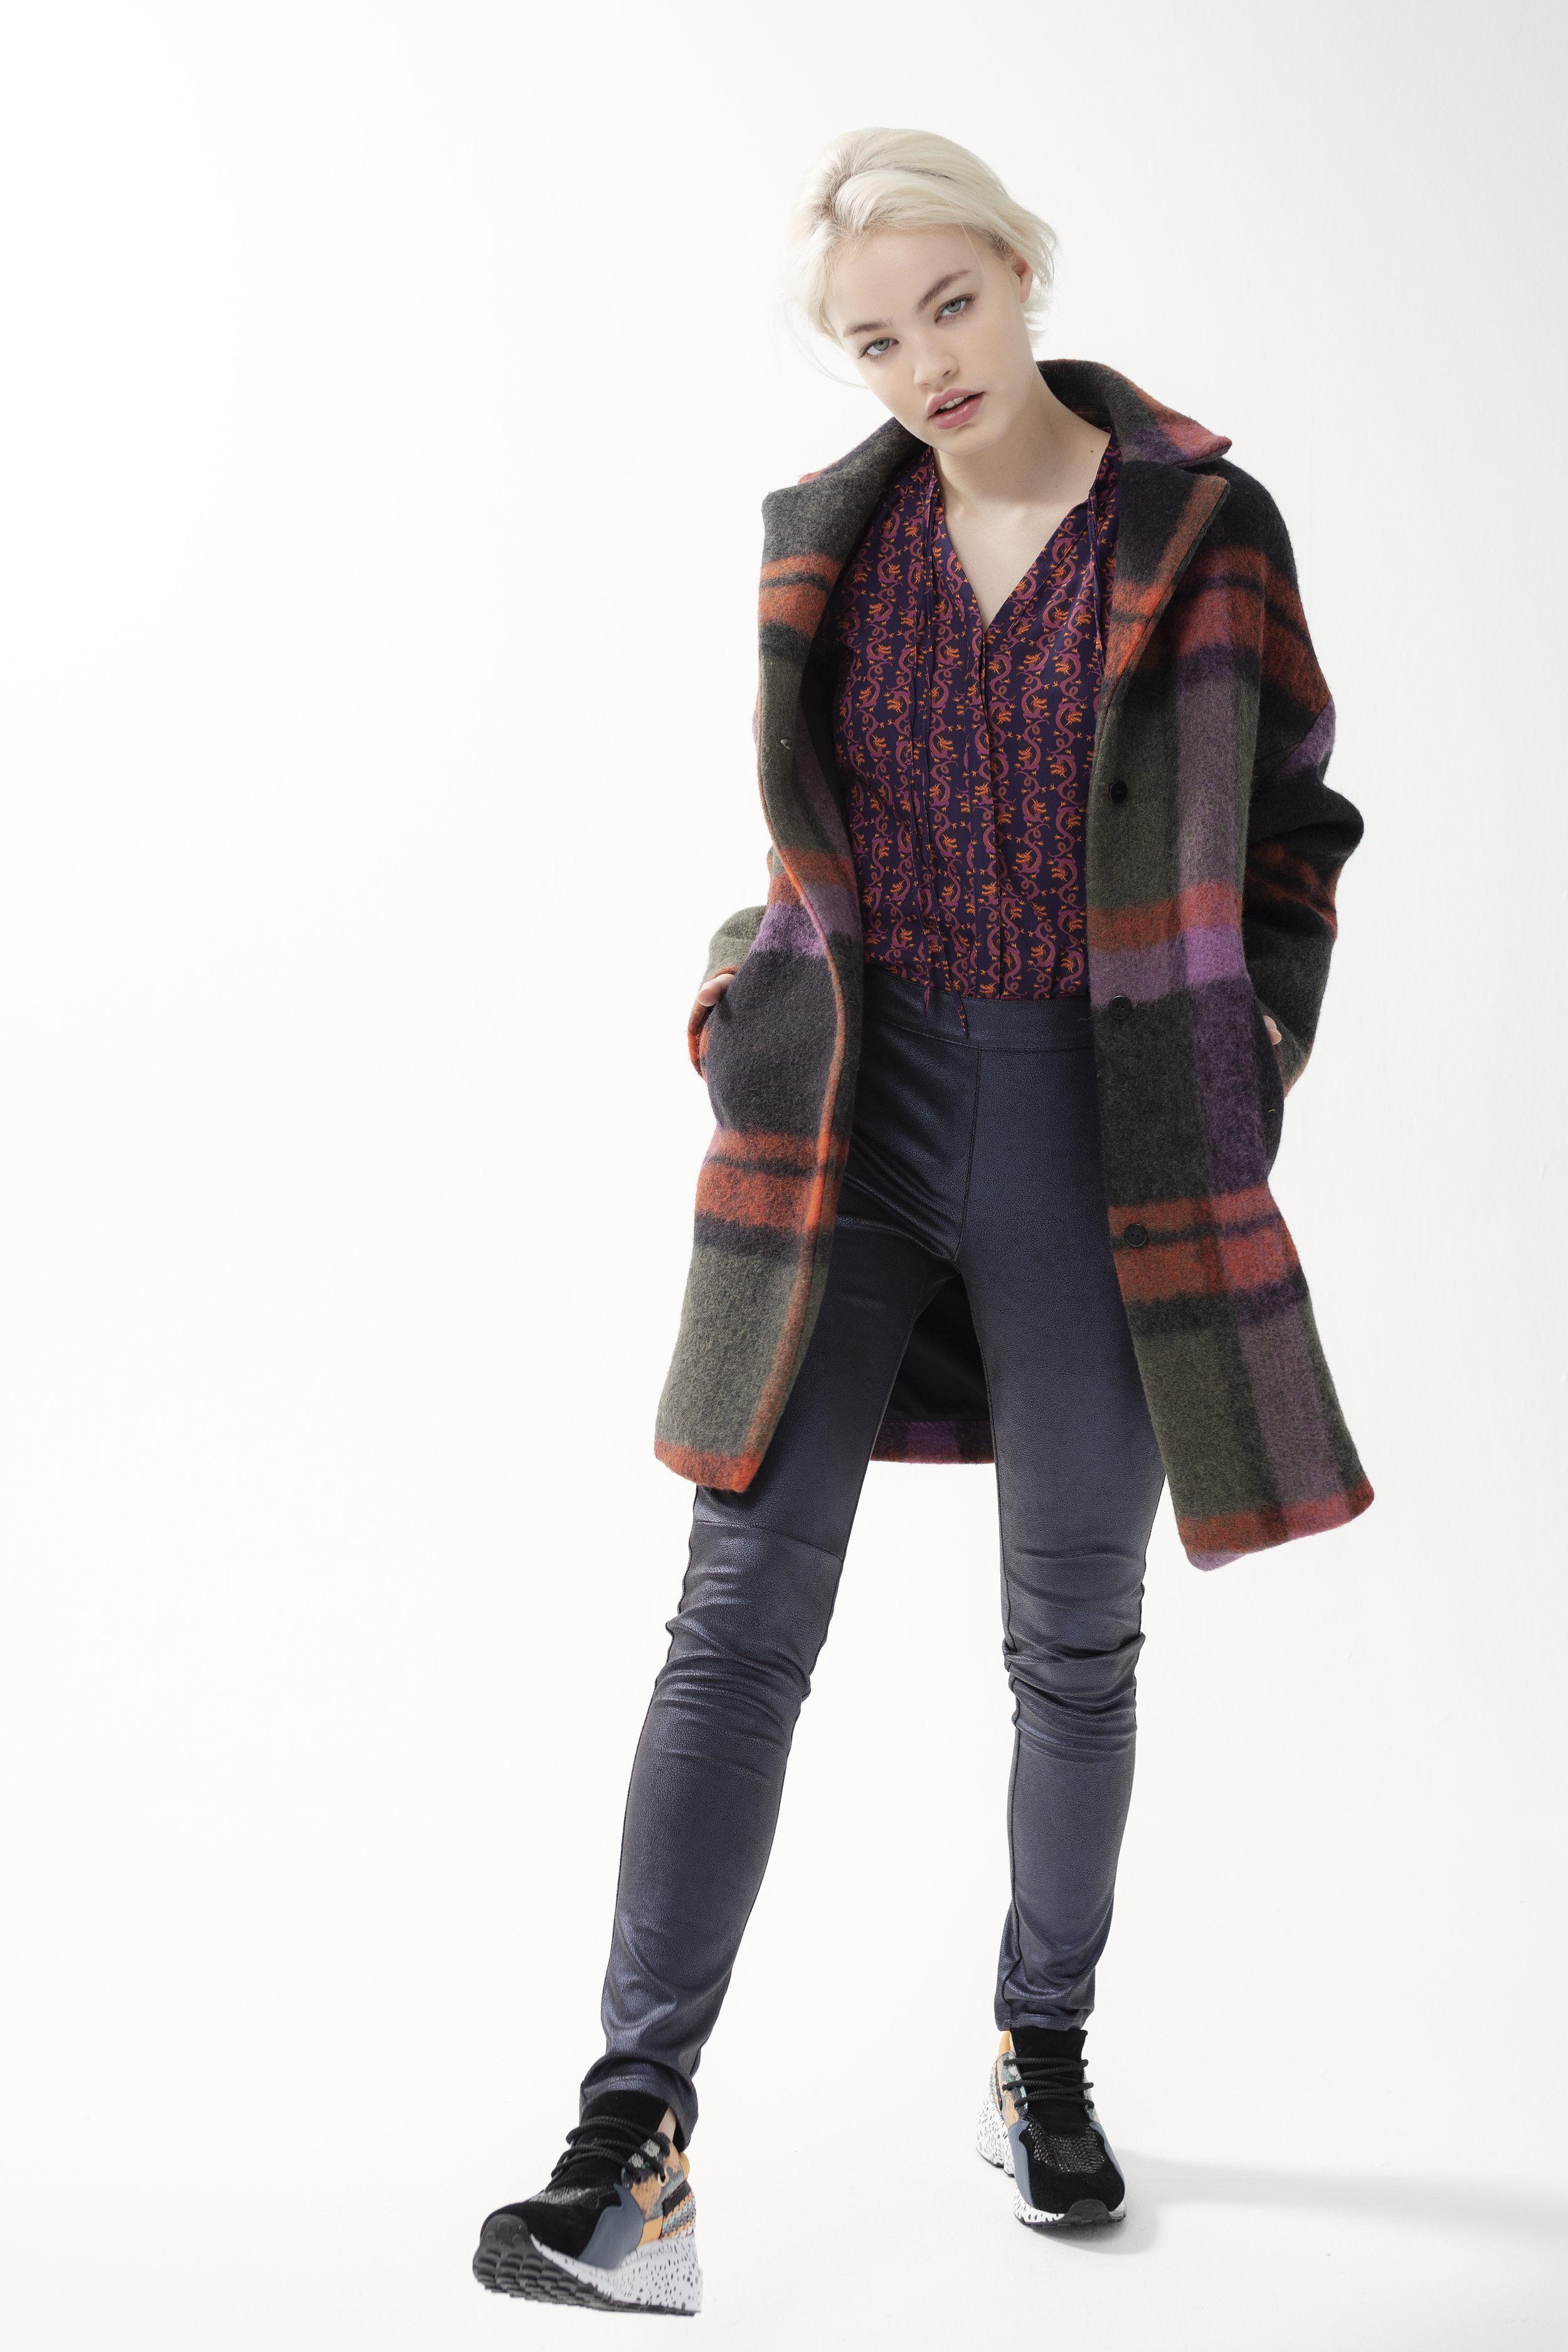 Shirt PISTACHE - drago | Jacket CHOCO - corcos | Trouser TROSSA - zamp